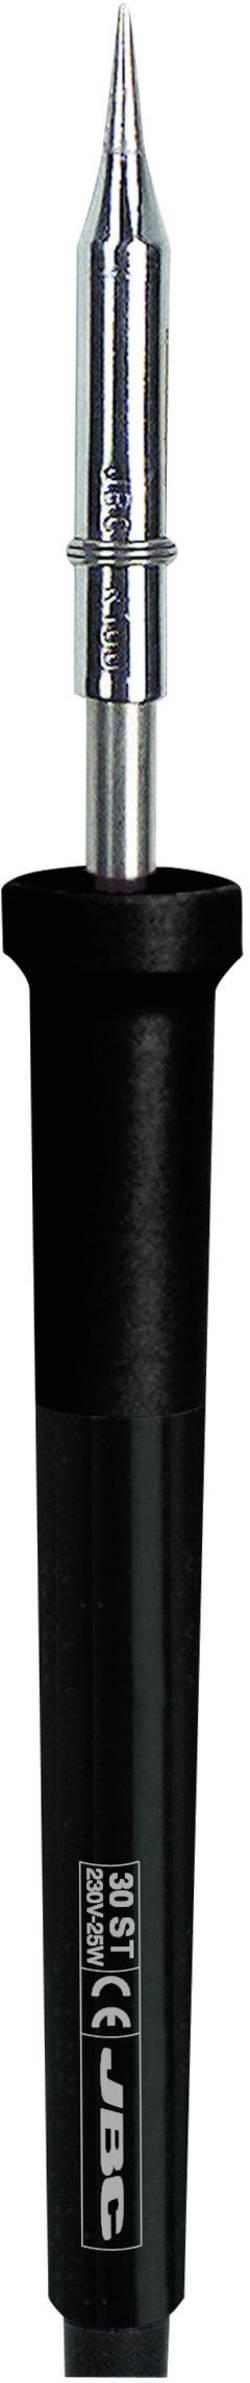 Fer à souder JBC 30S 25 W +380 °C (max)